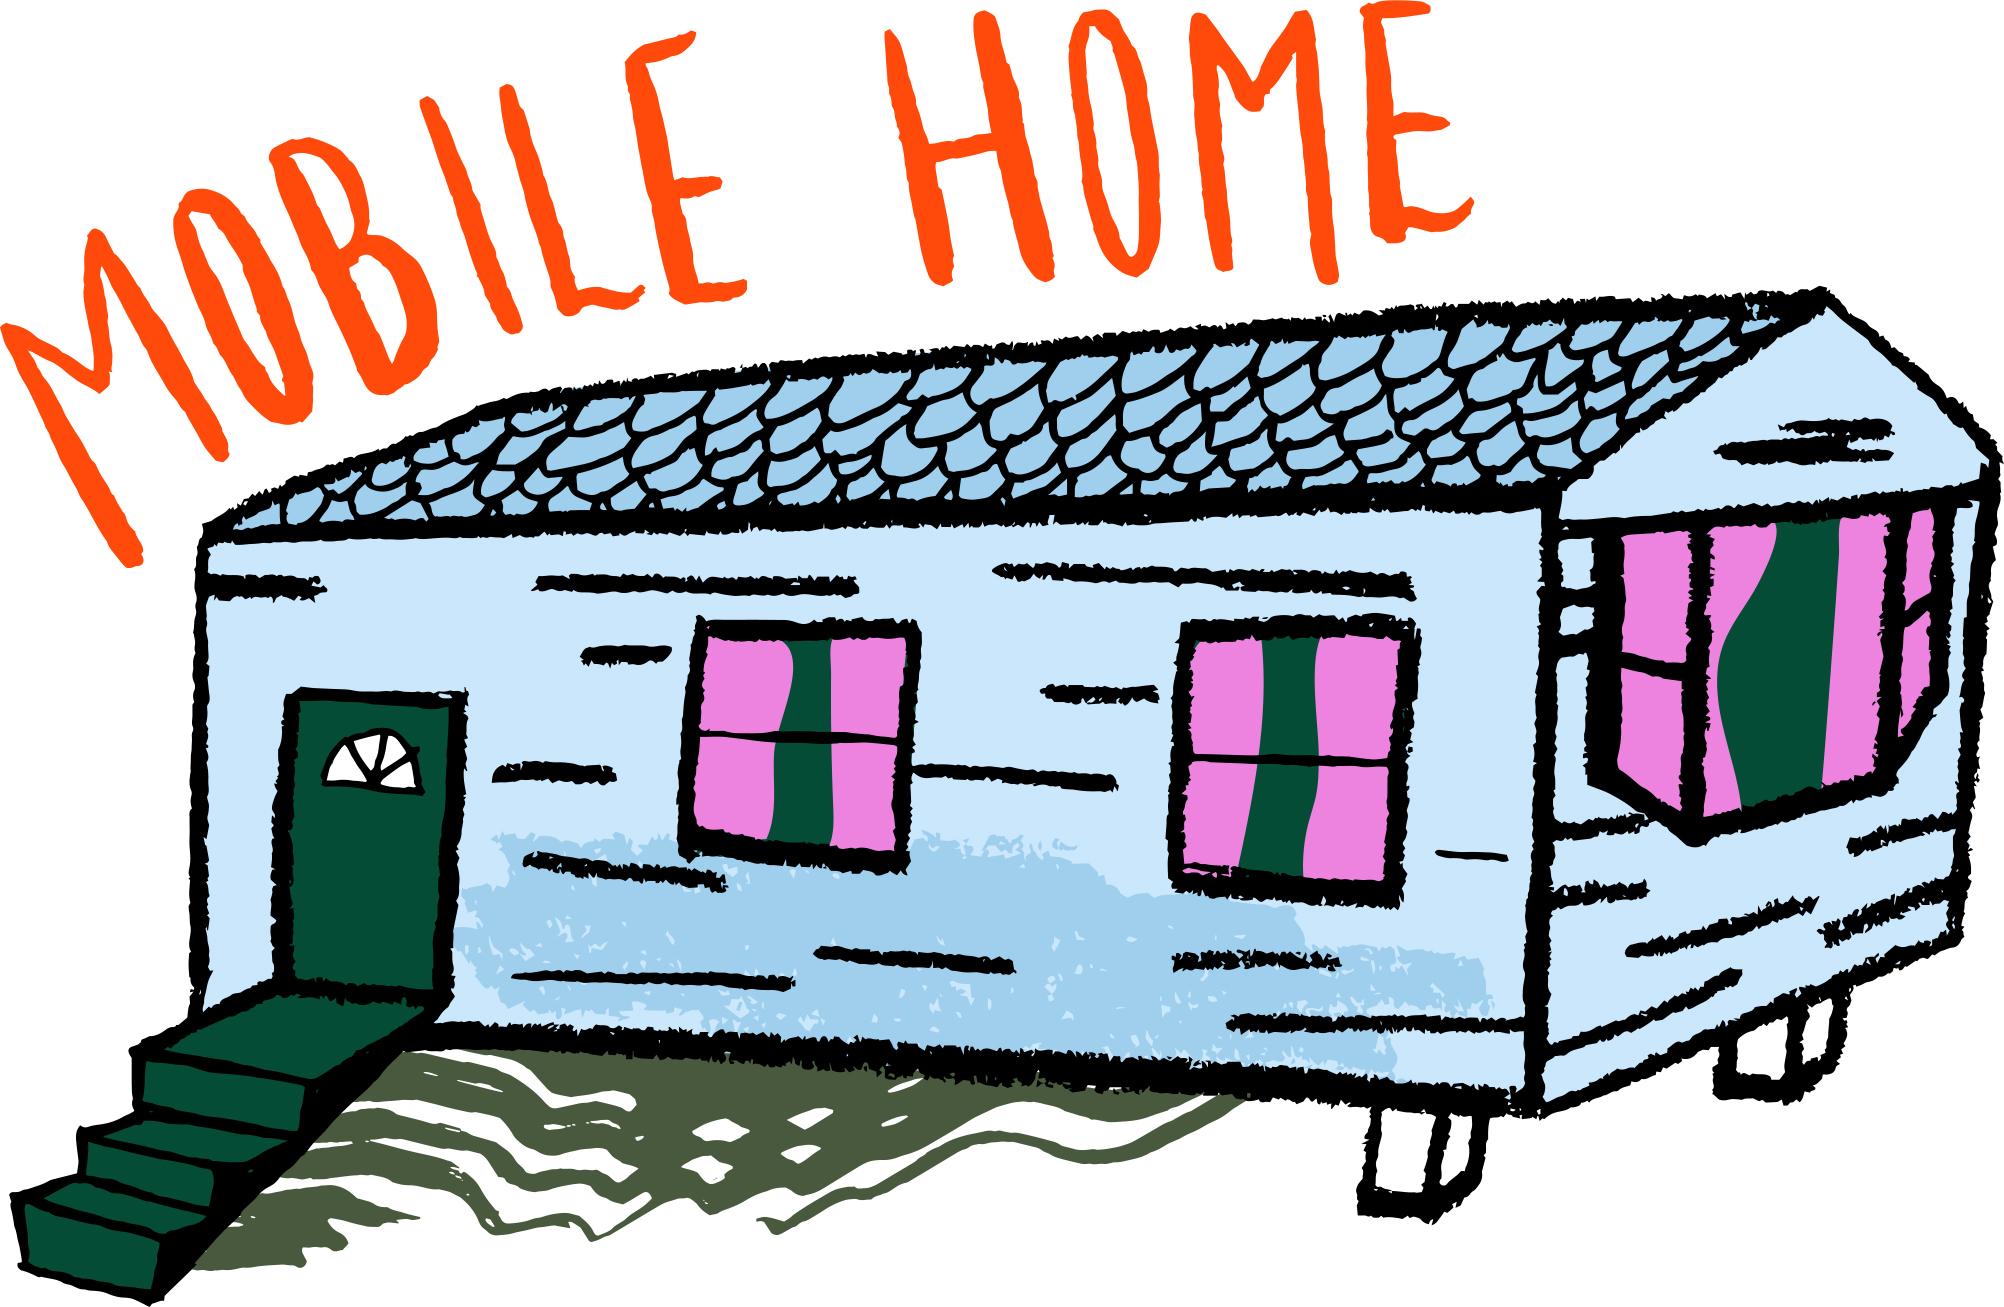 2004x1307 Clipart Of Mobile Homes Jaxstormrealverseus, Mobile Home Art